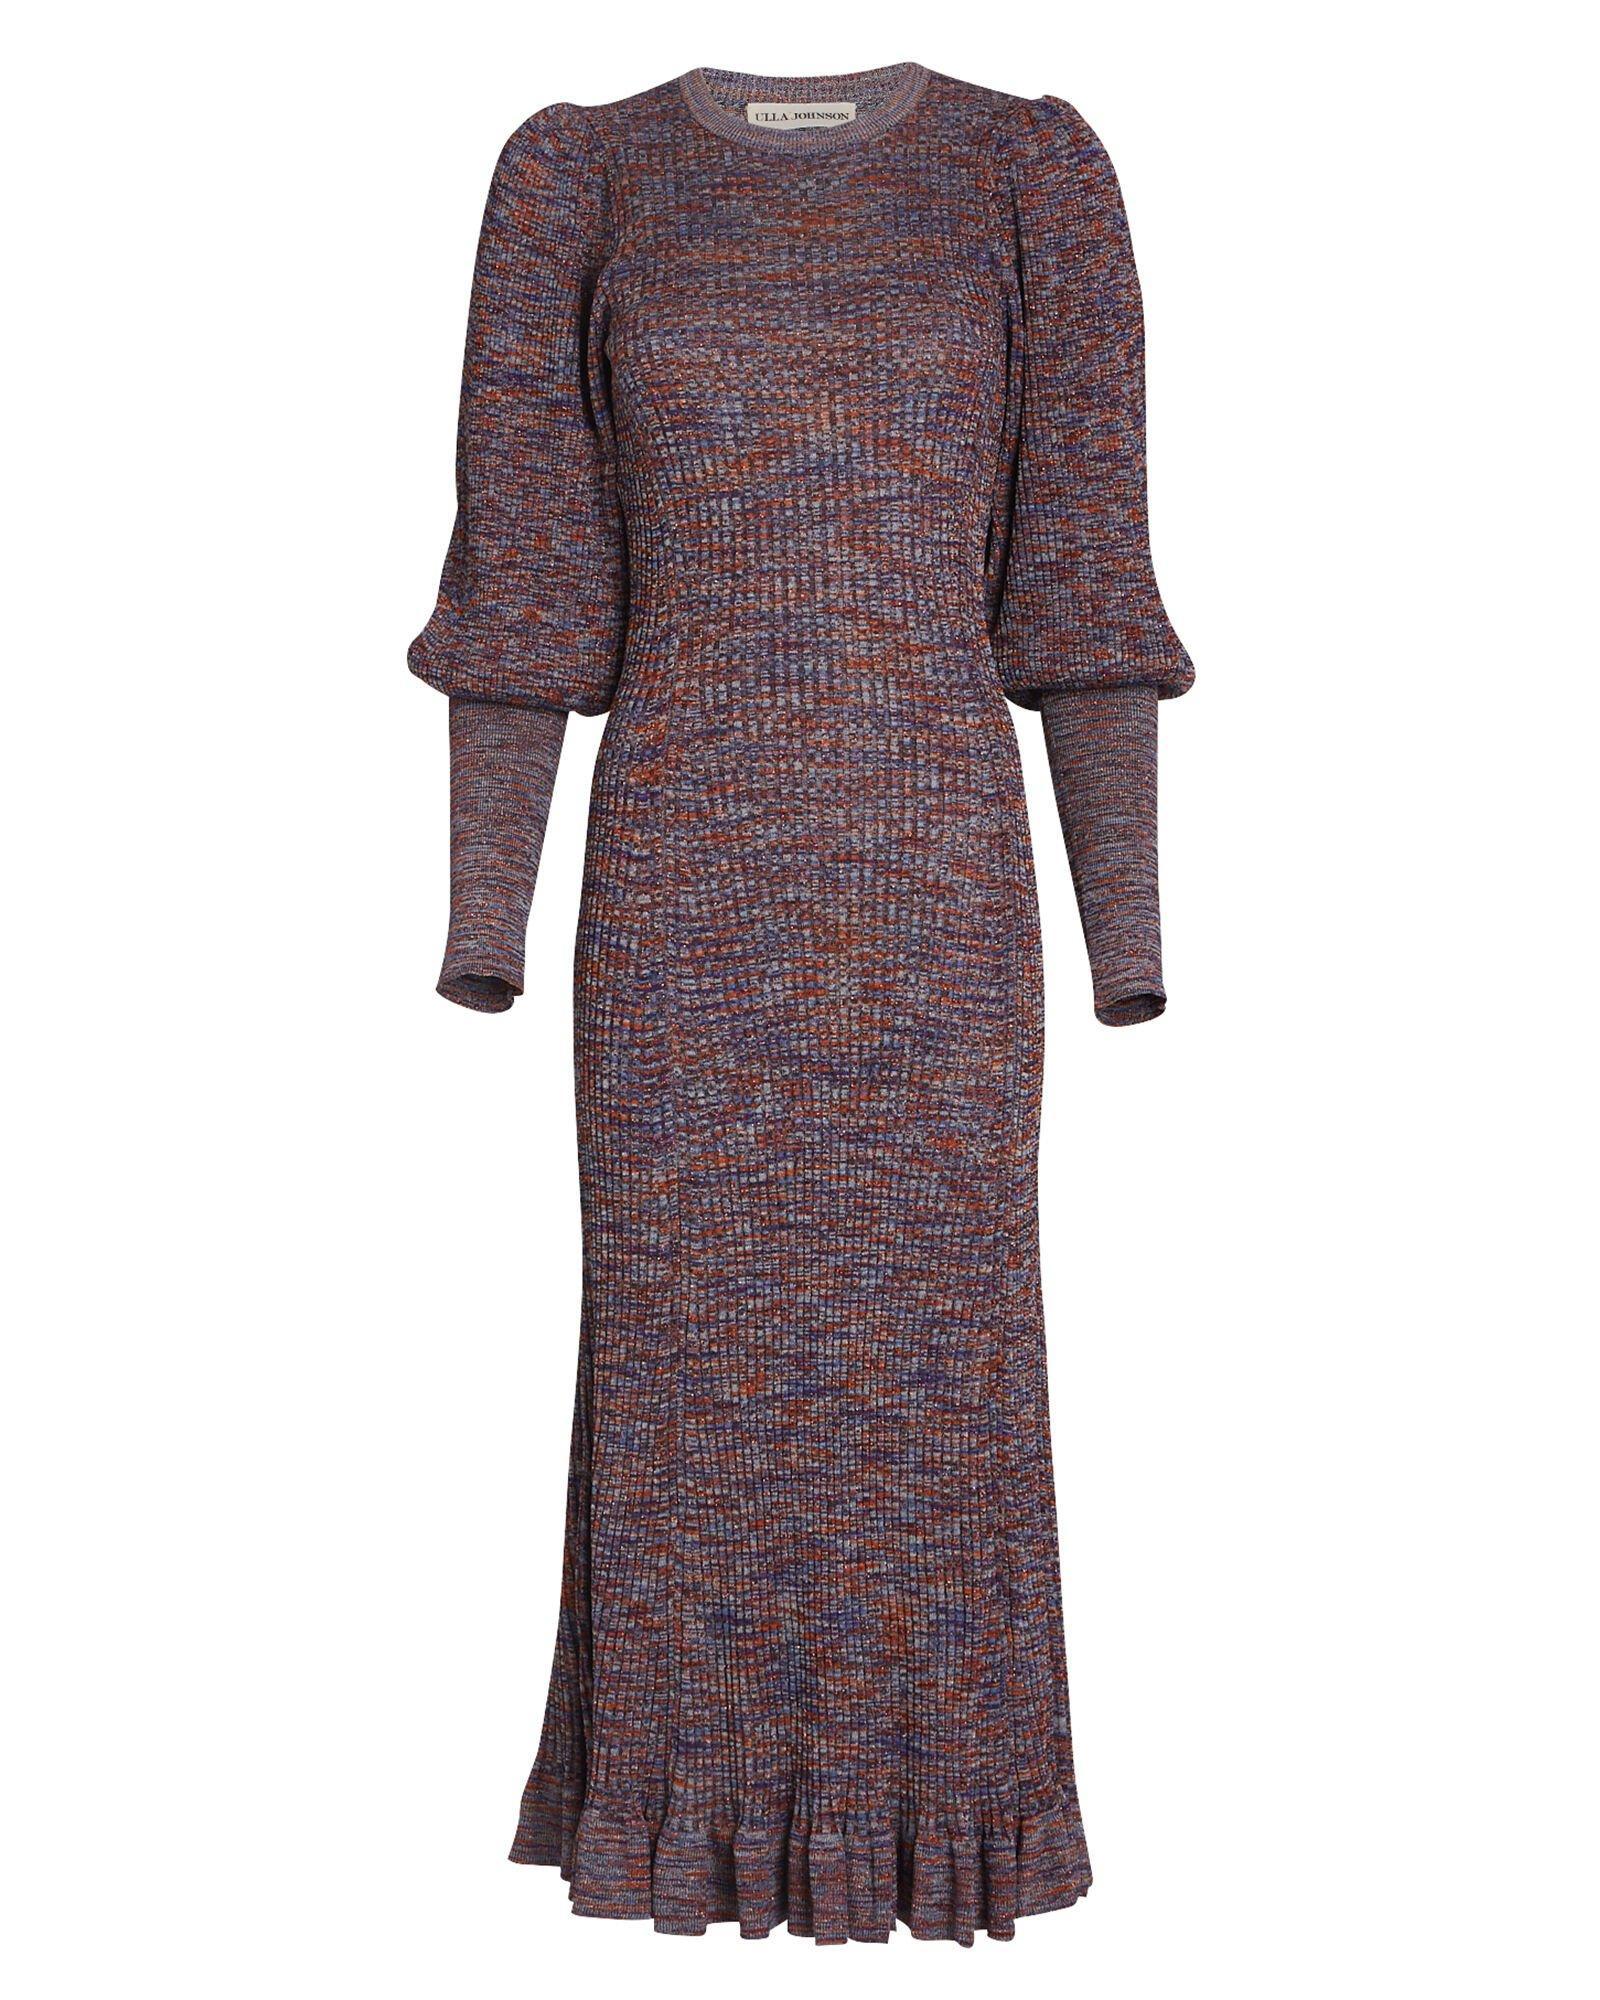 Ulla Johnson Women's Quinn Dress, $695 @amazon.com